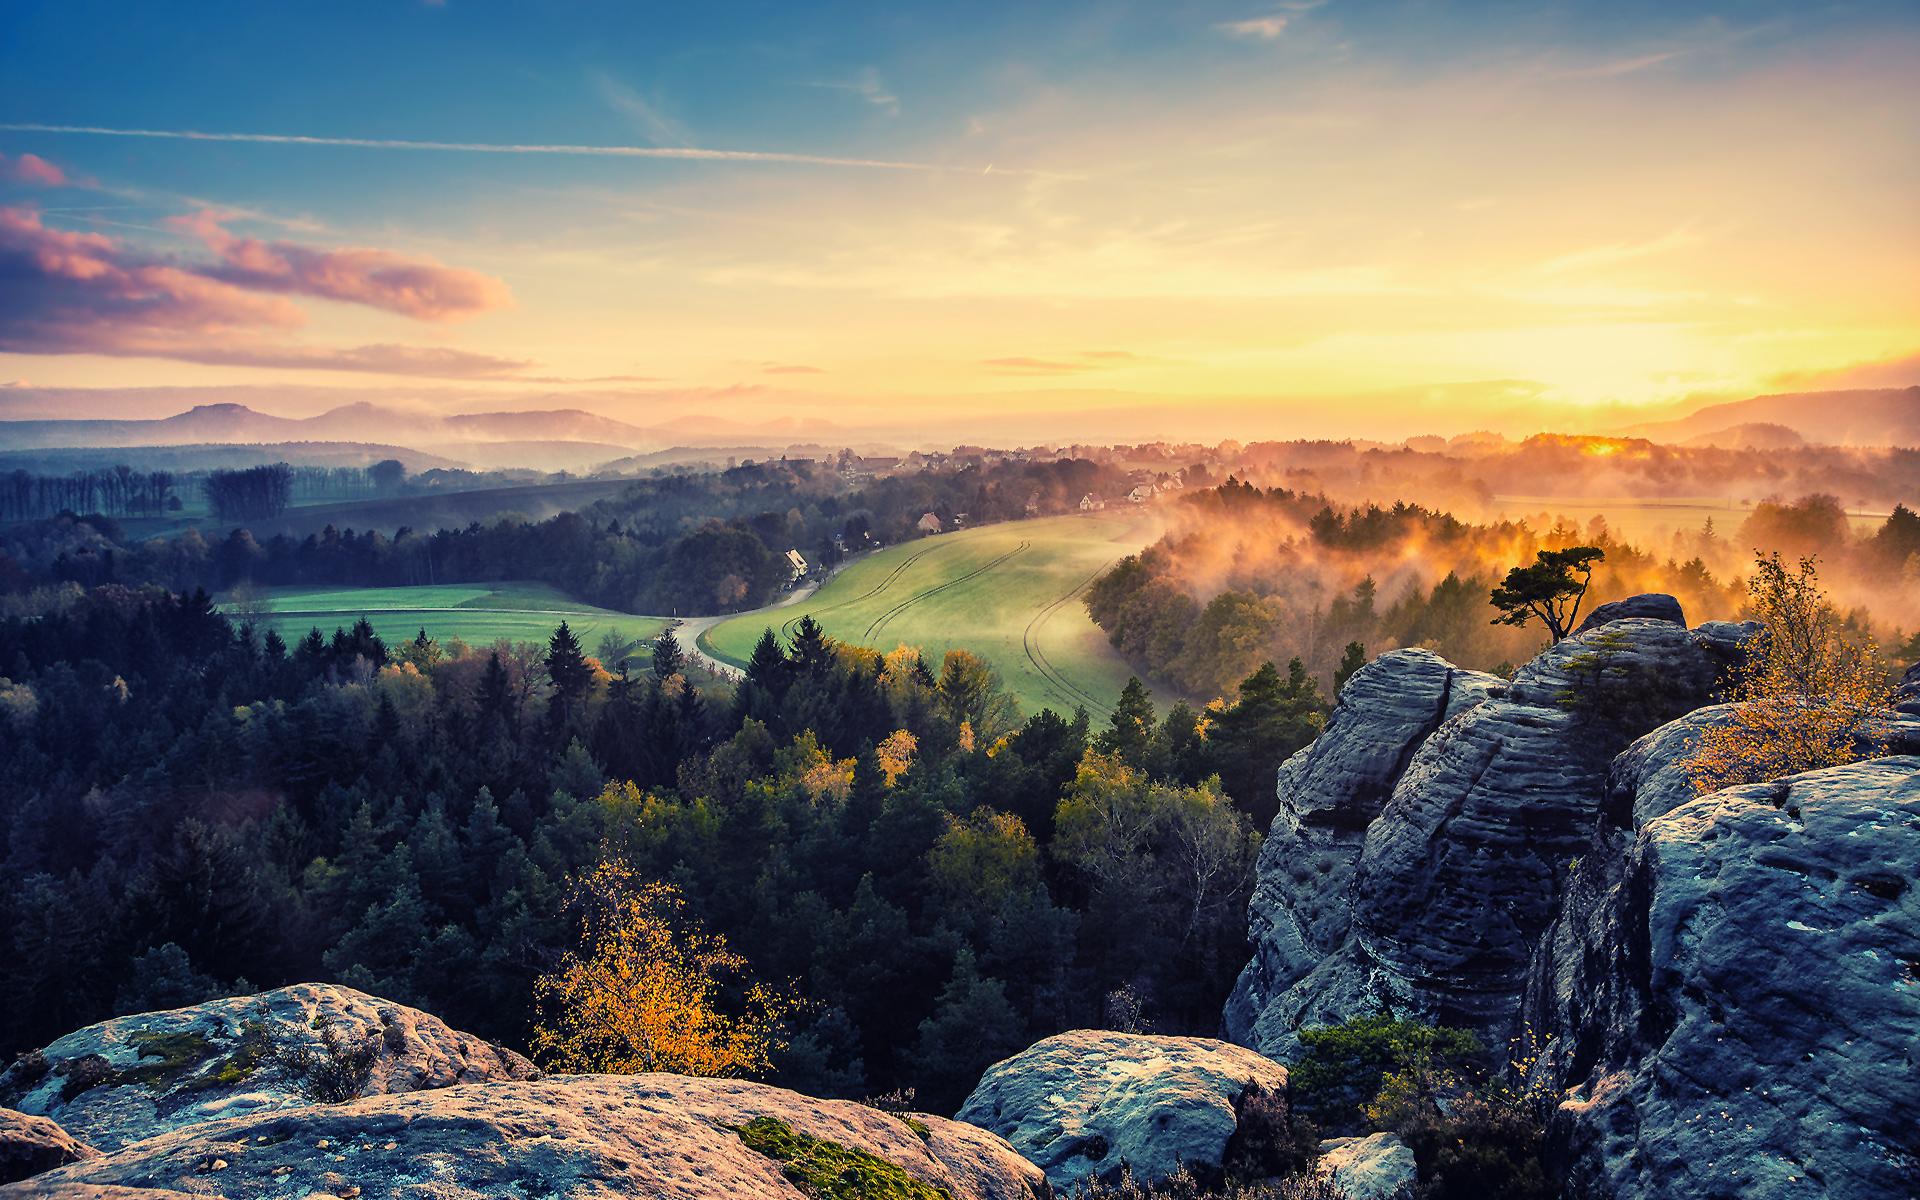 Valley sunset 7017053 1920x1200